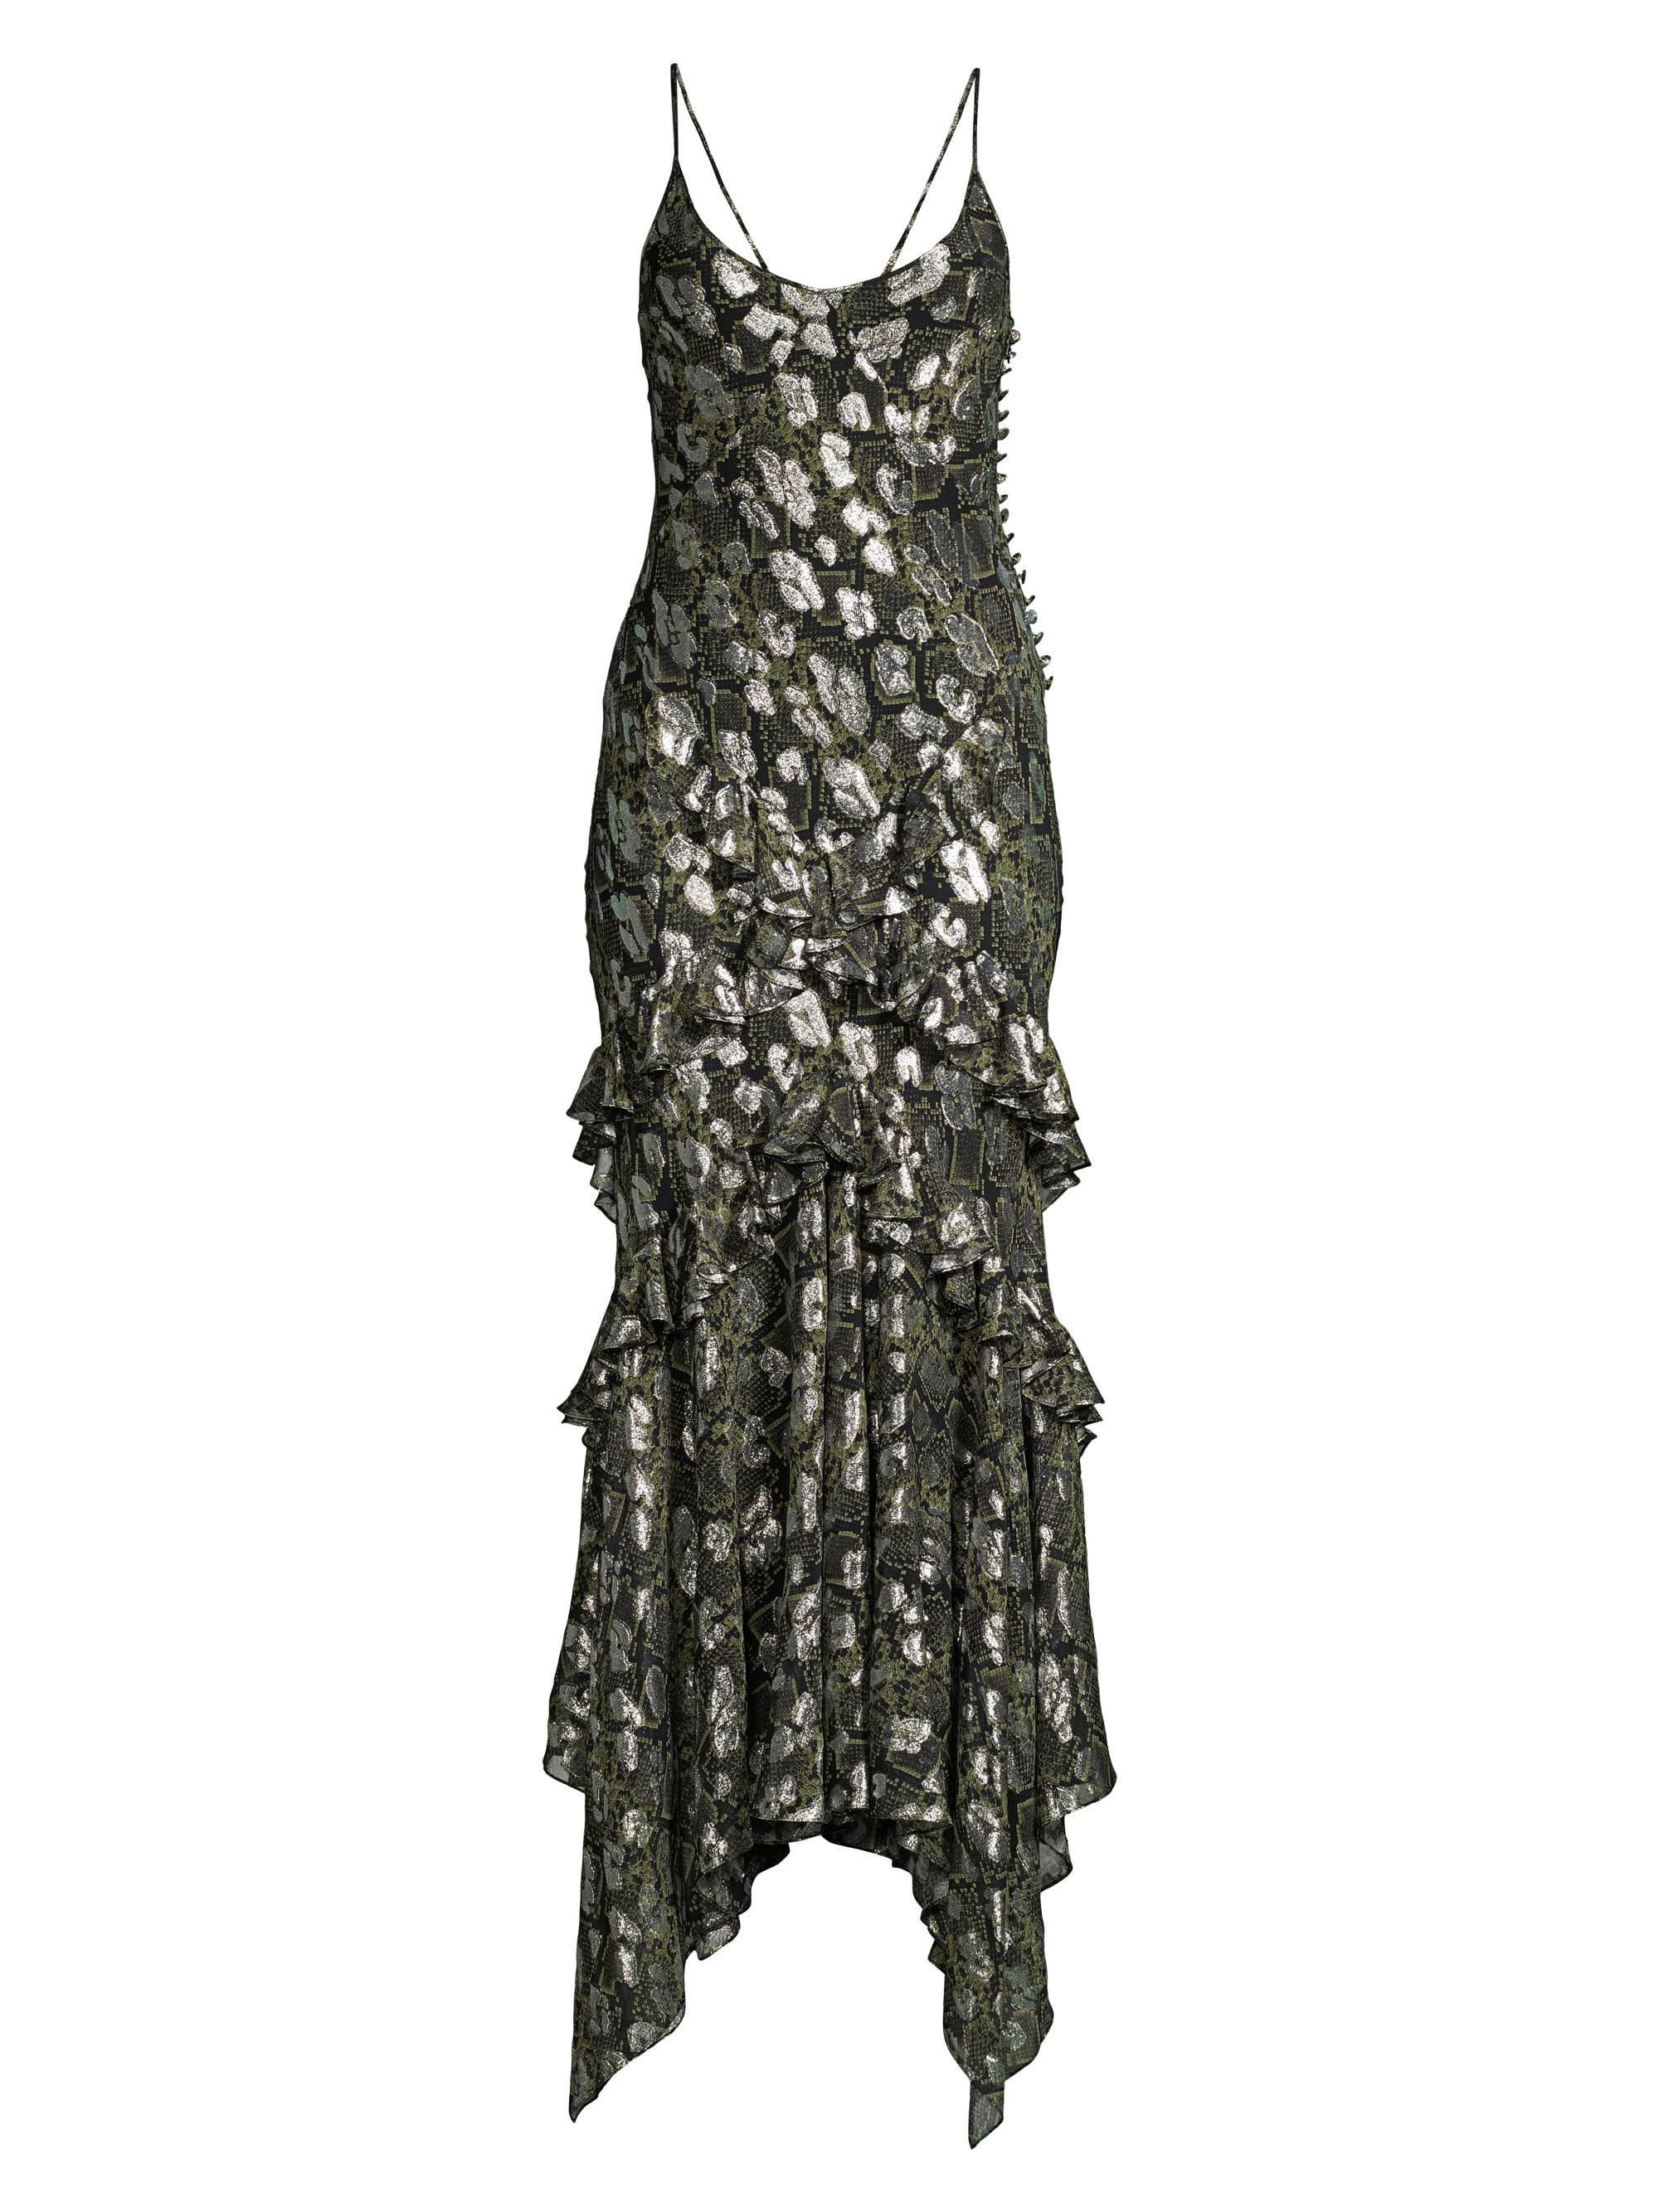 4fb86a0359 Lyst - Michael Kors Women's Ruffled Metallic Python-print Slip Dress ...